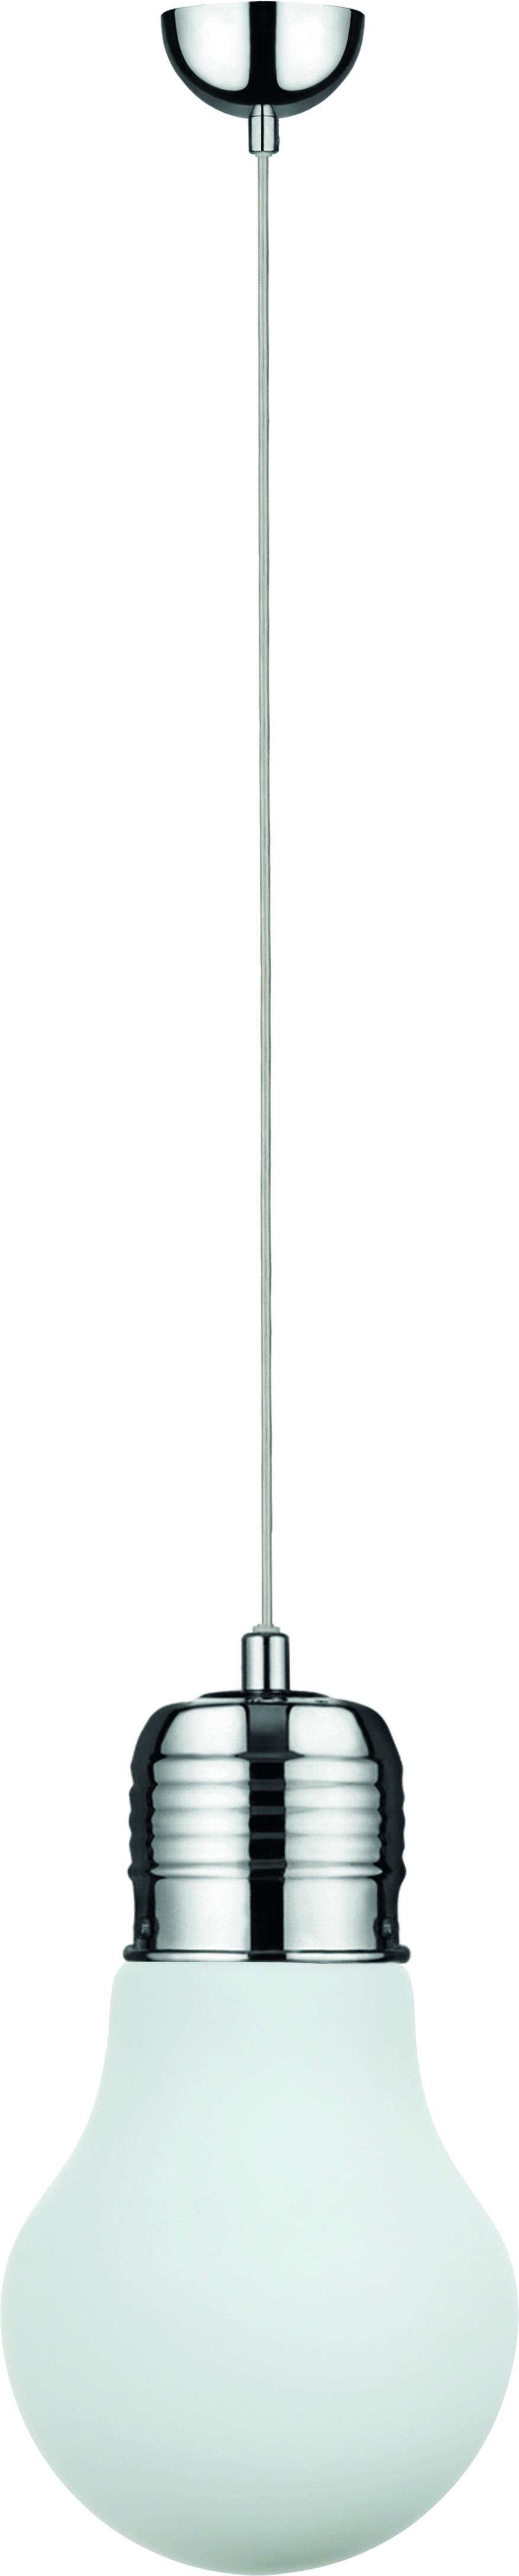 Loftowa Lampa wisząca Bulb chrome / white E27 60W